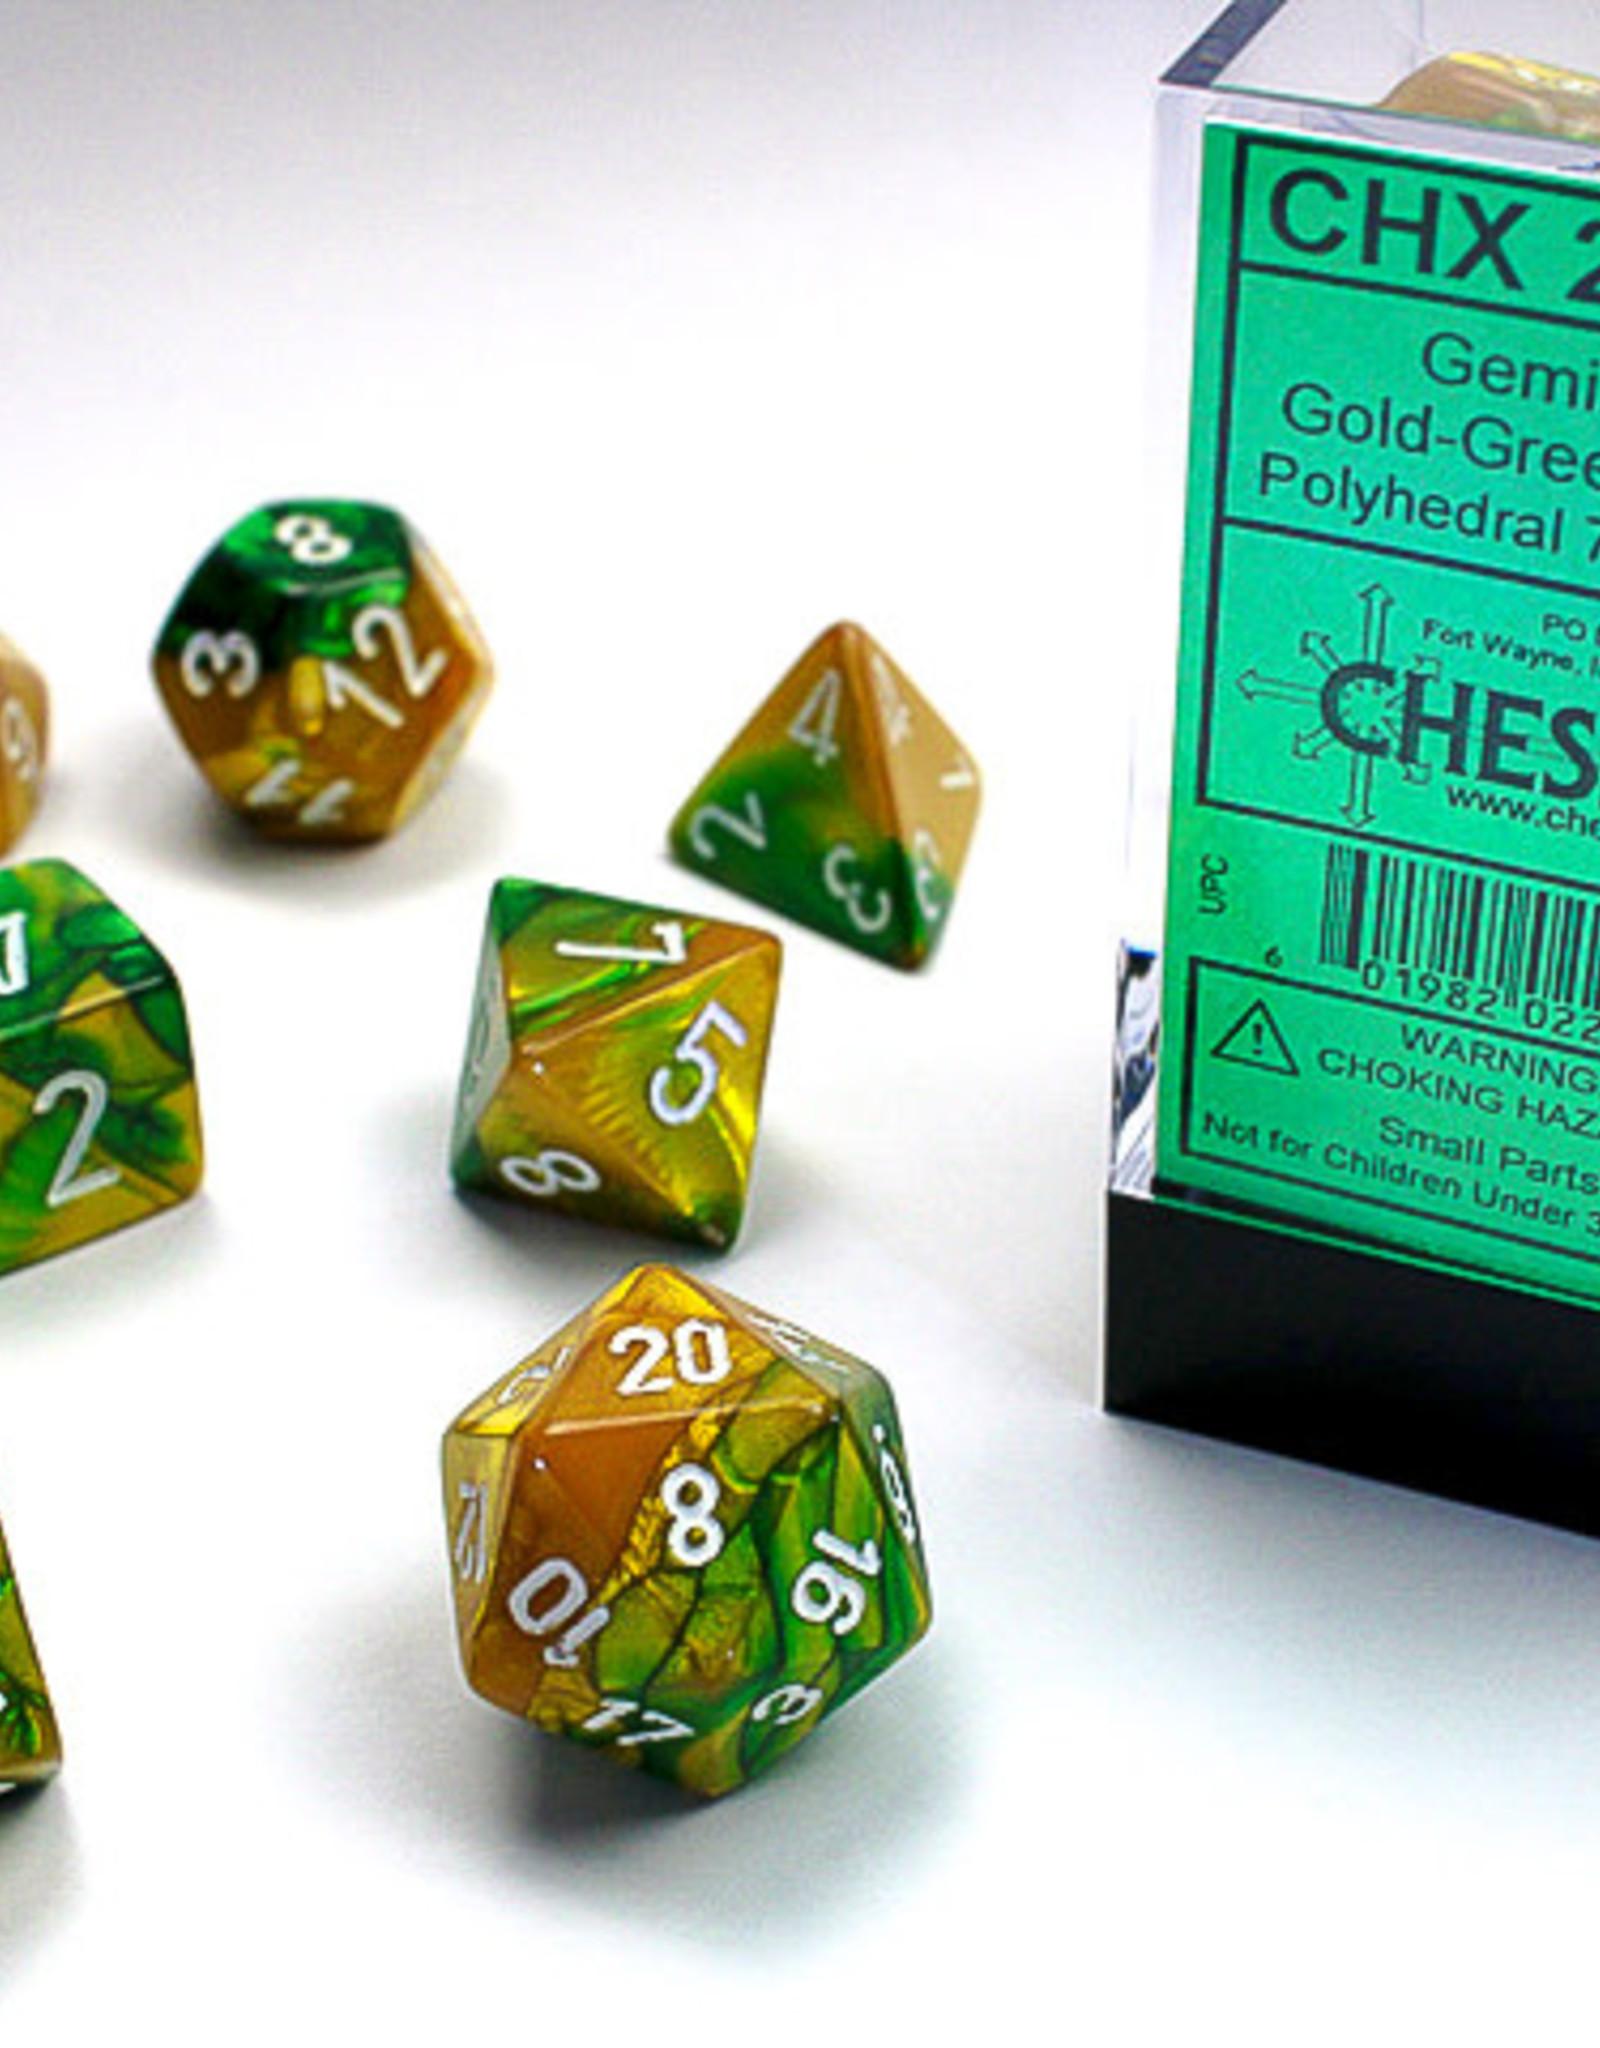 Chessex DICE GEMINI 7-DIE SET GOLD-GREEN/WHITE